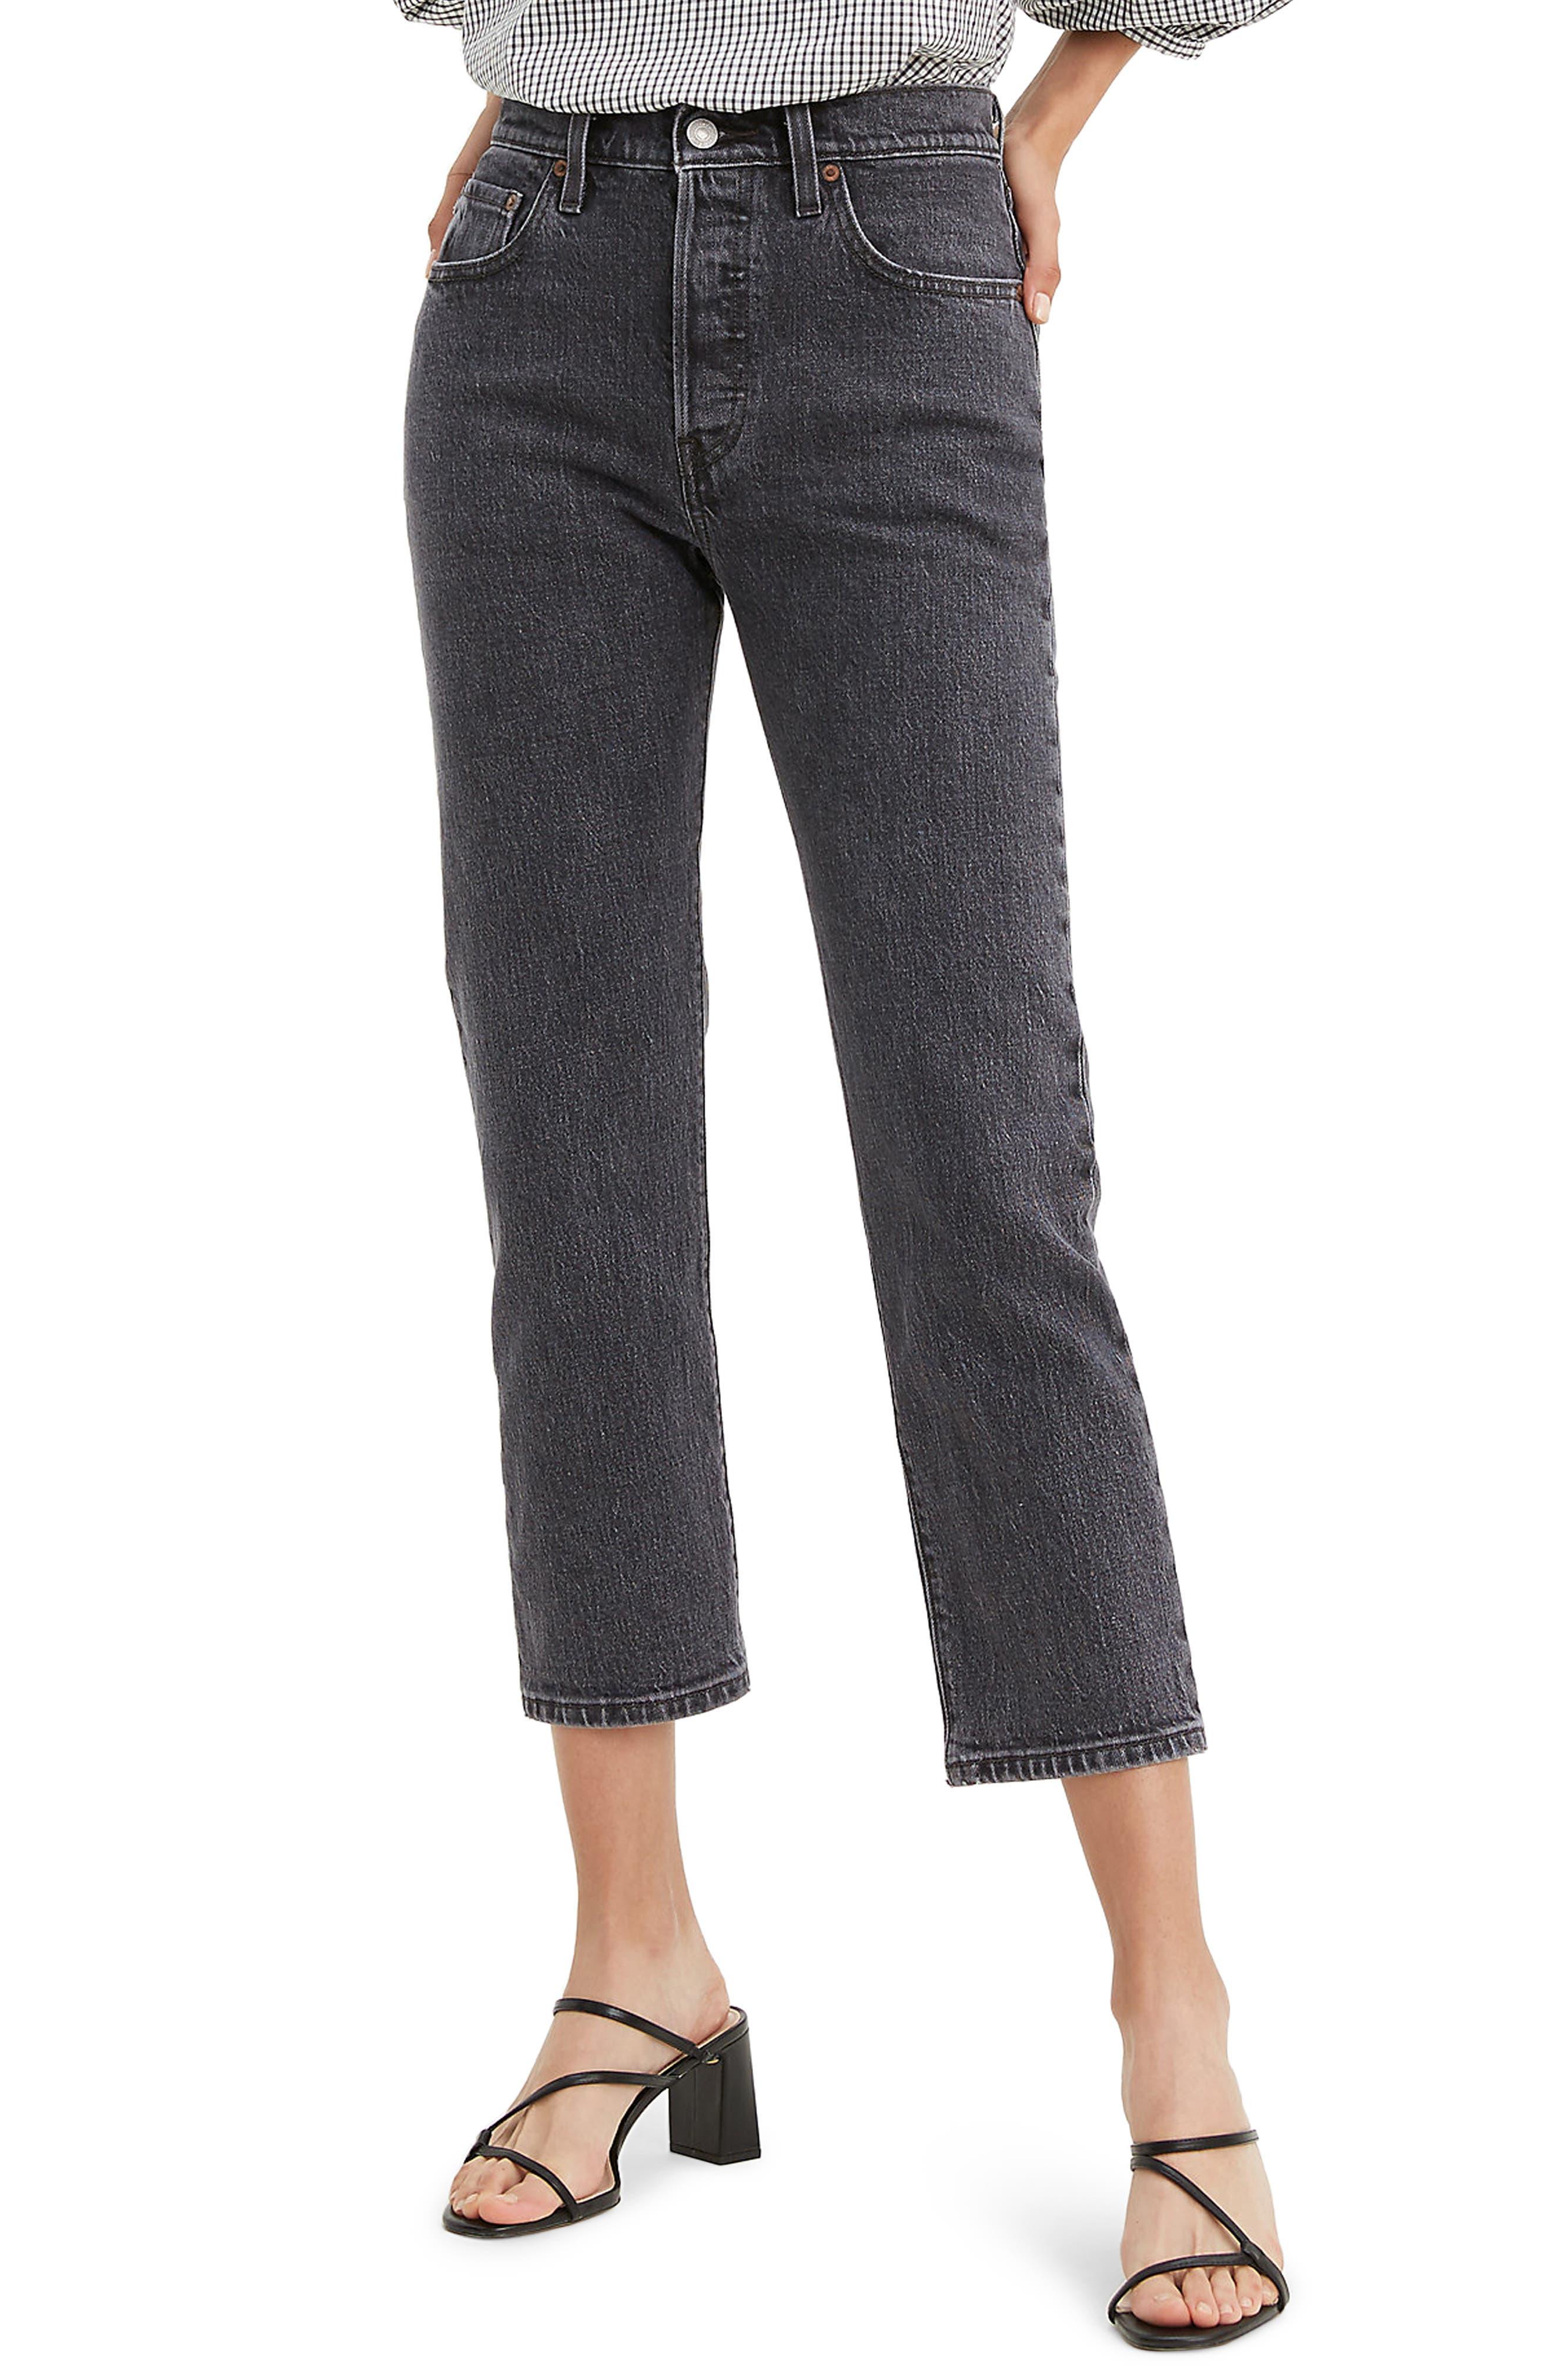 Women's Levi's 501 High Waist Crop Straight Leg Jeans,  31 x 26 - Grey